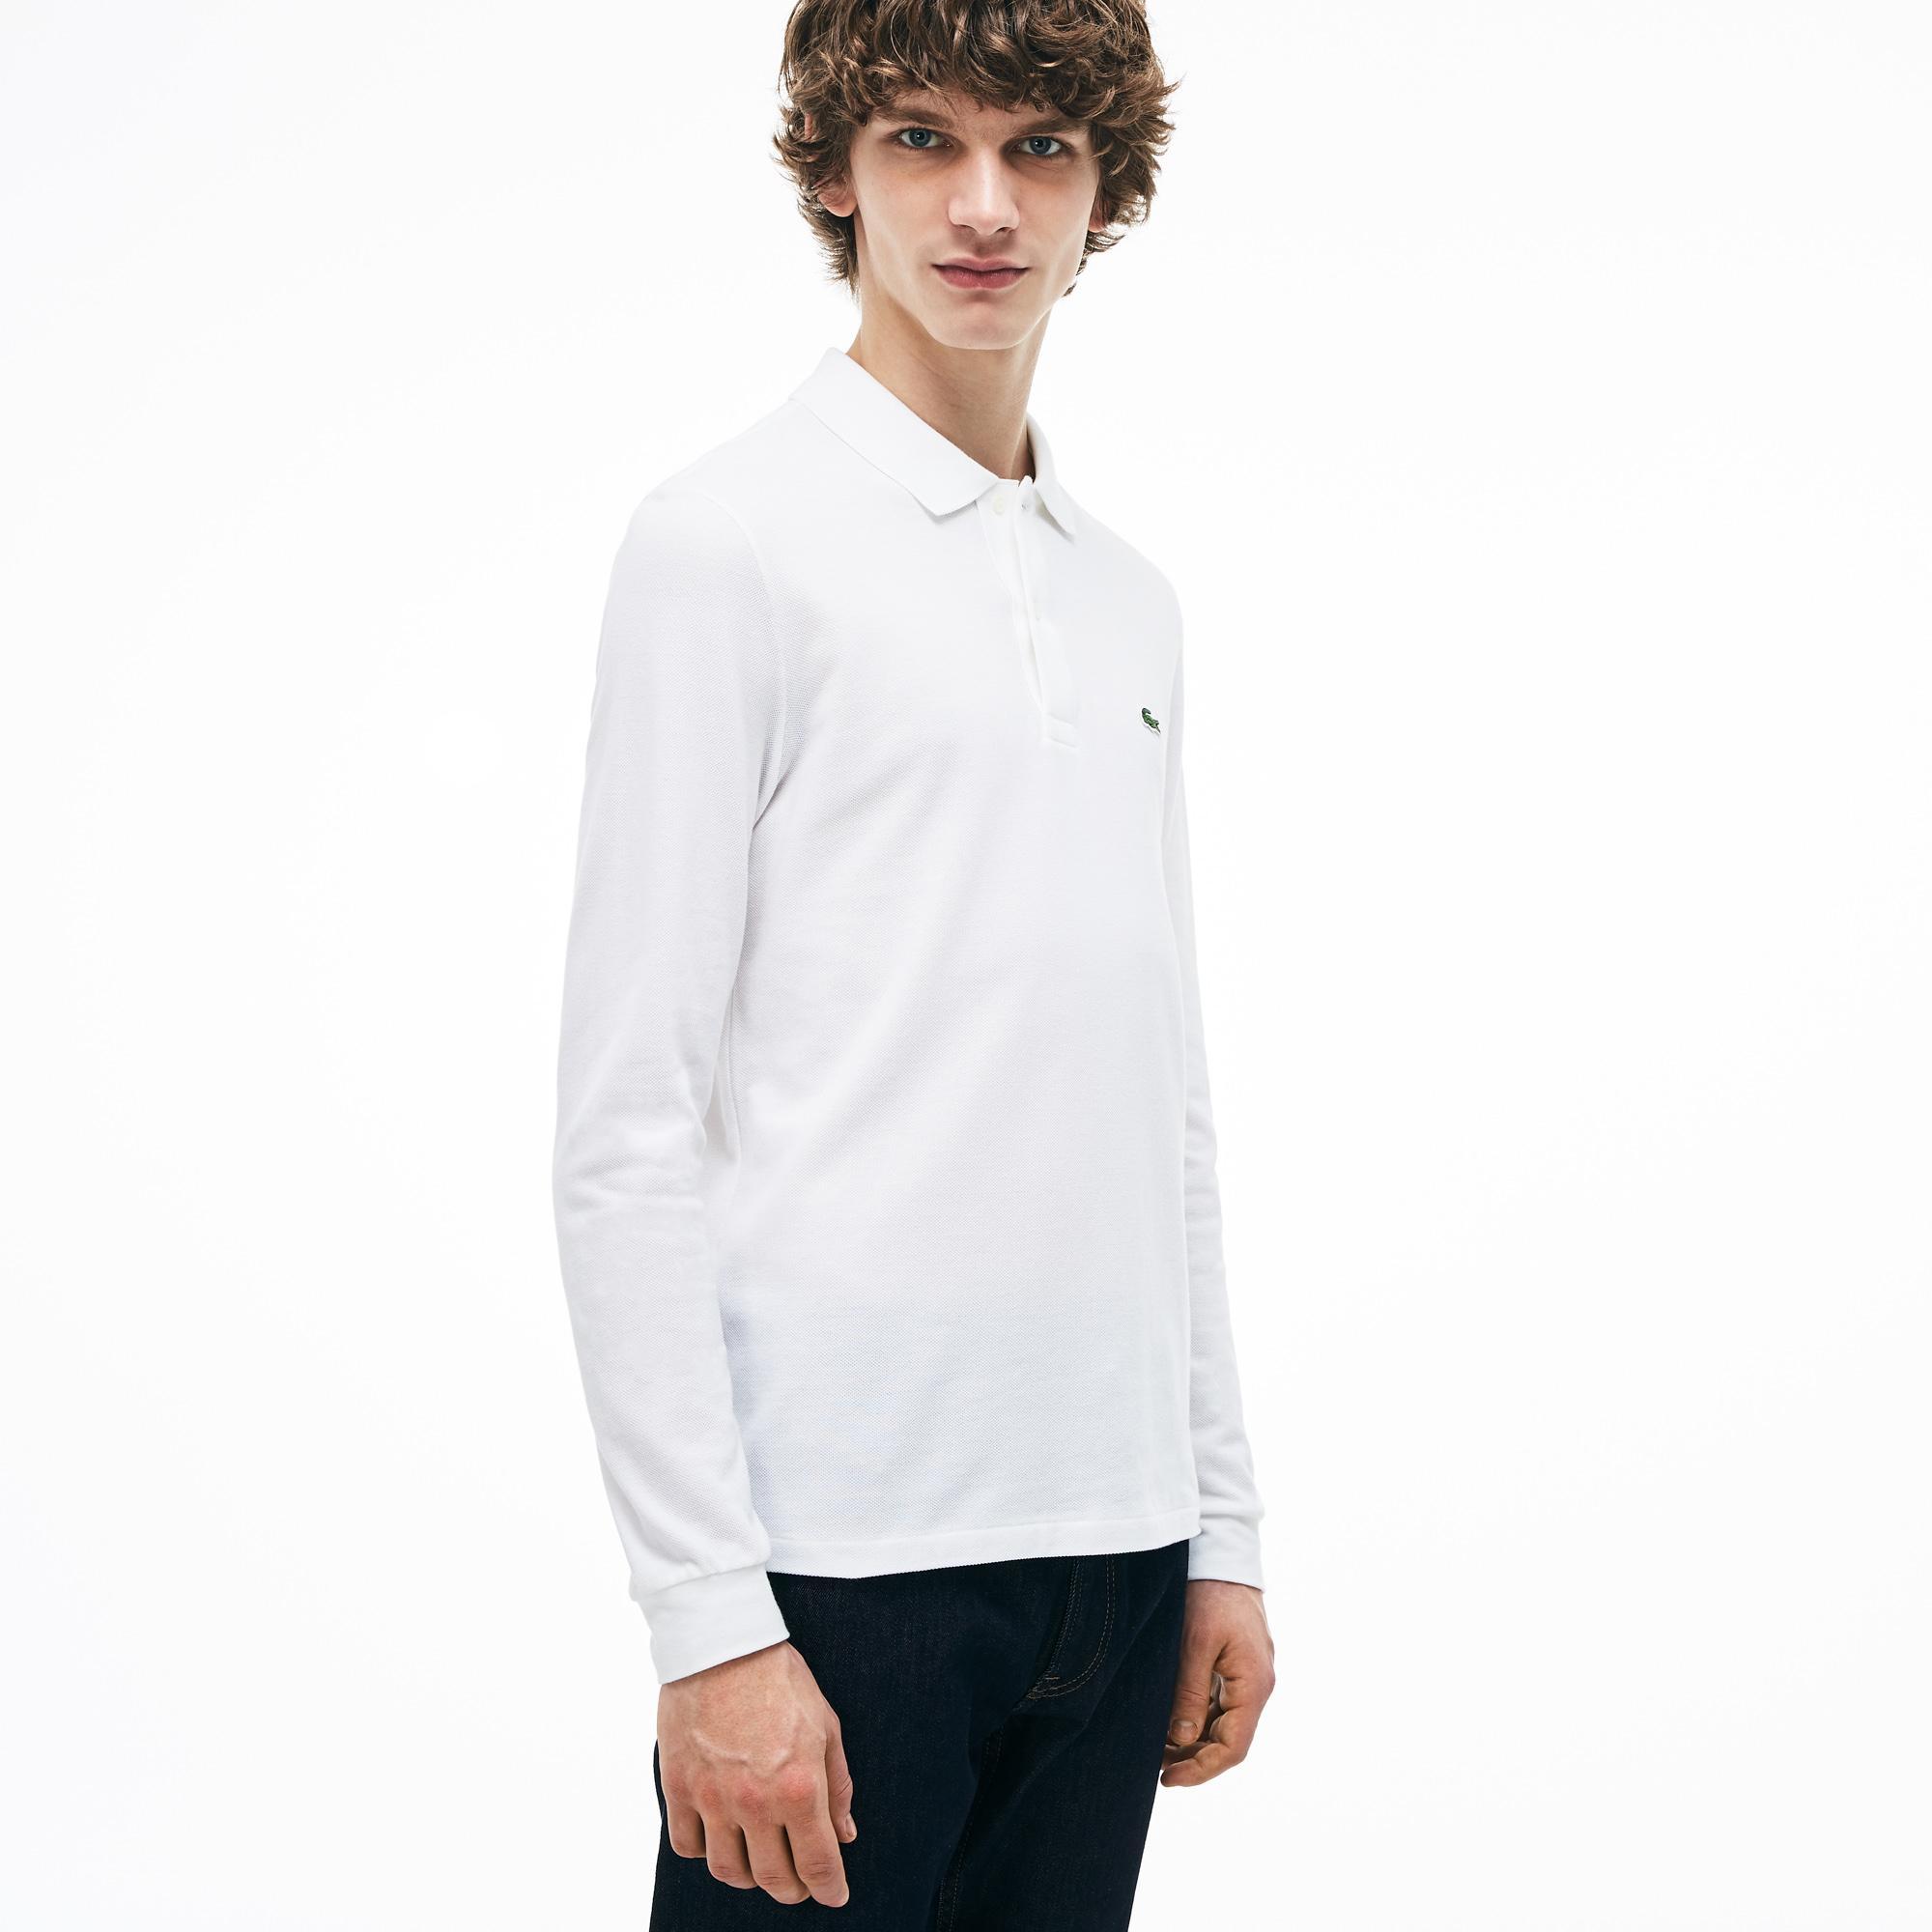 Lacoste Men's Long-Sleeve Classic Fit L.13.12 Polo